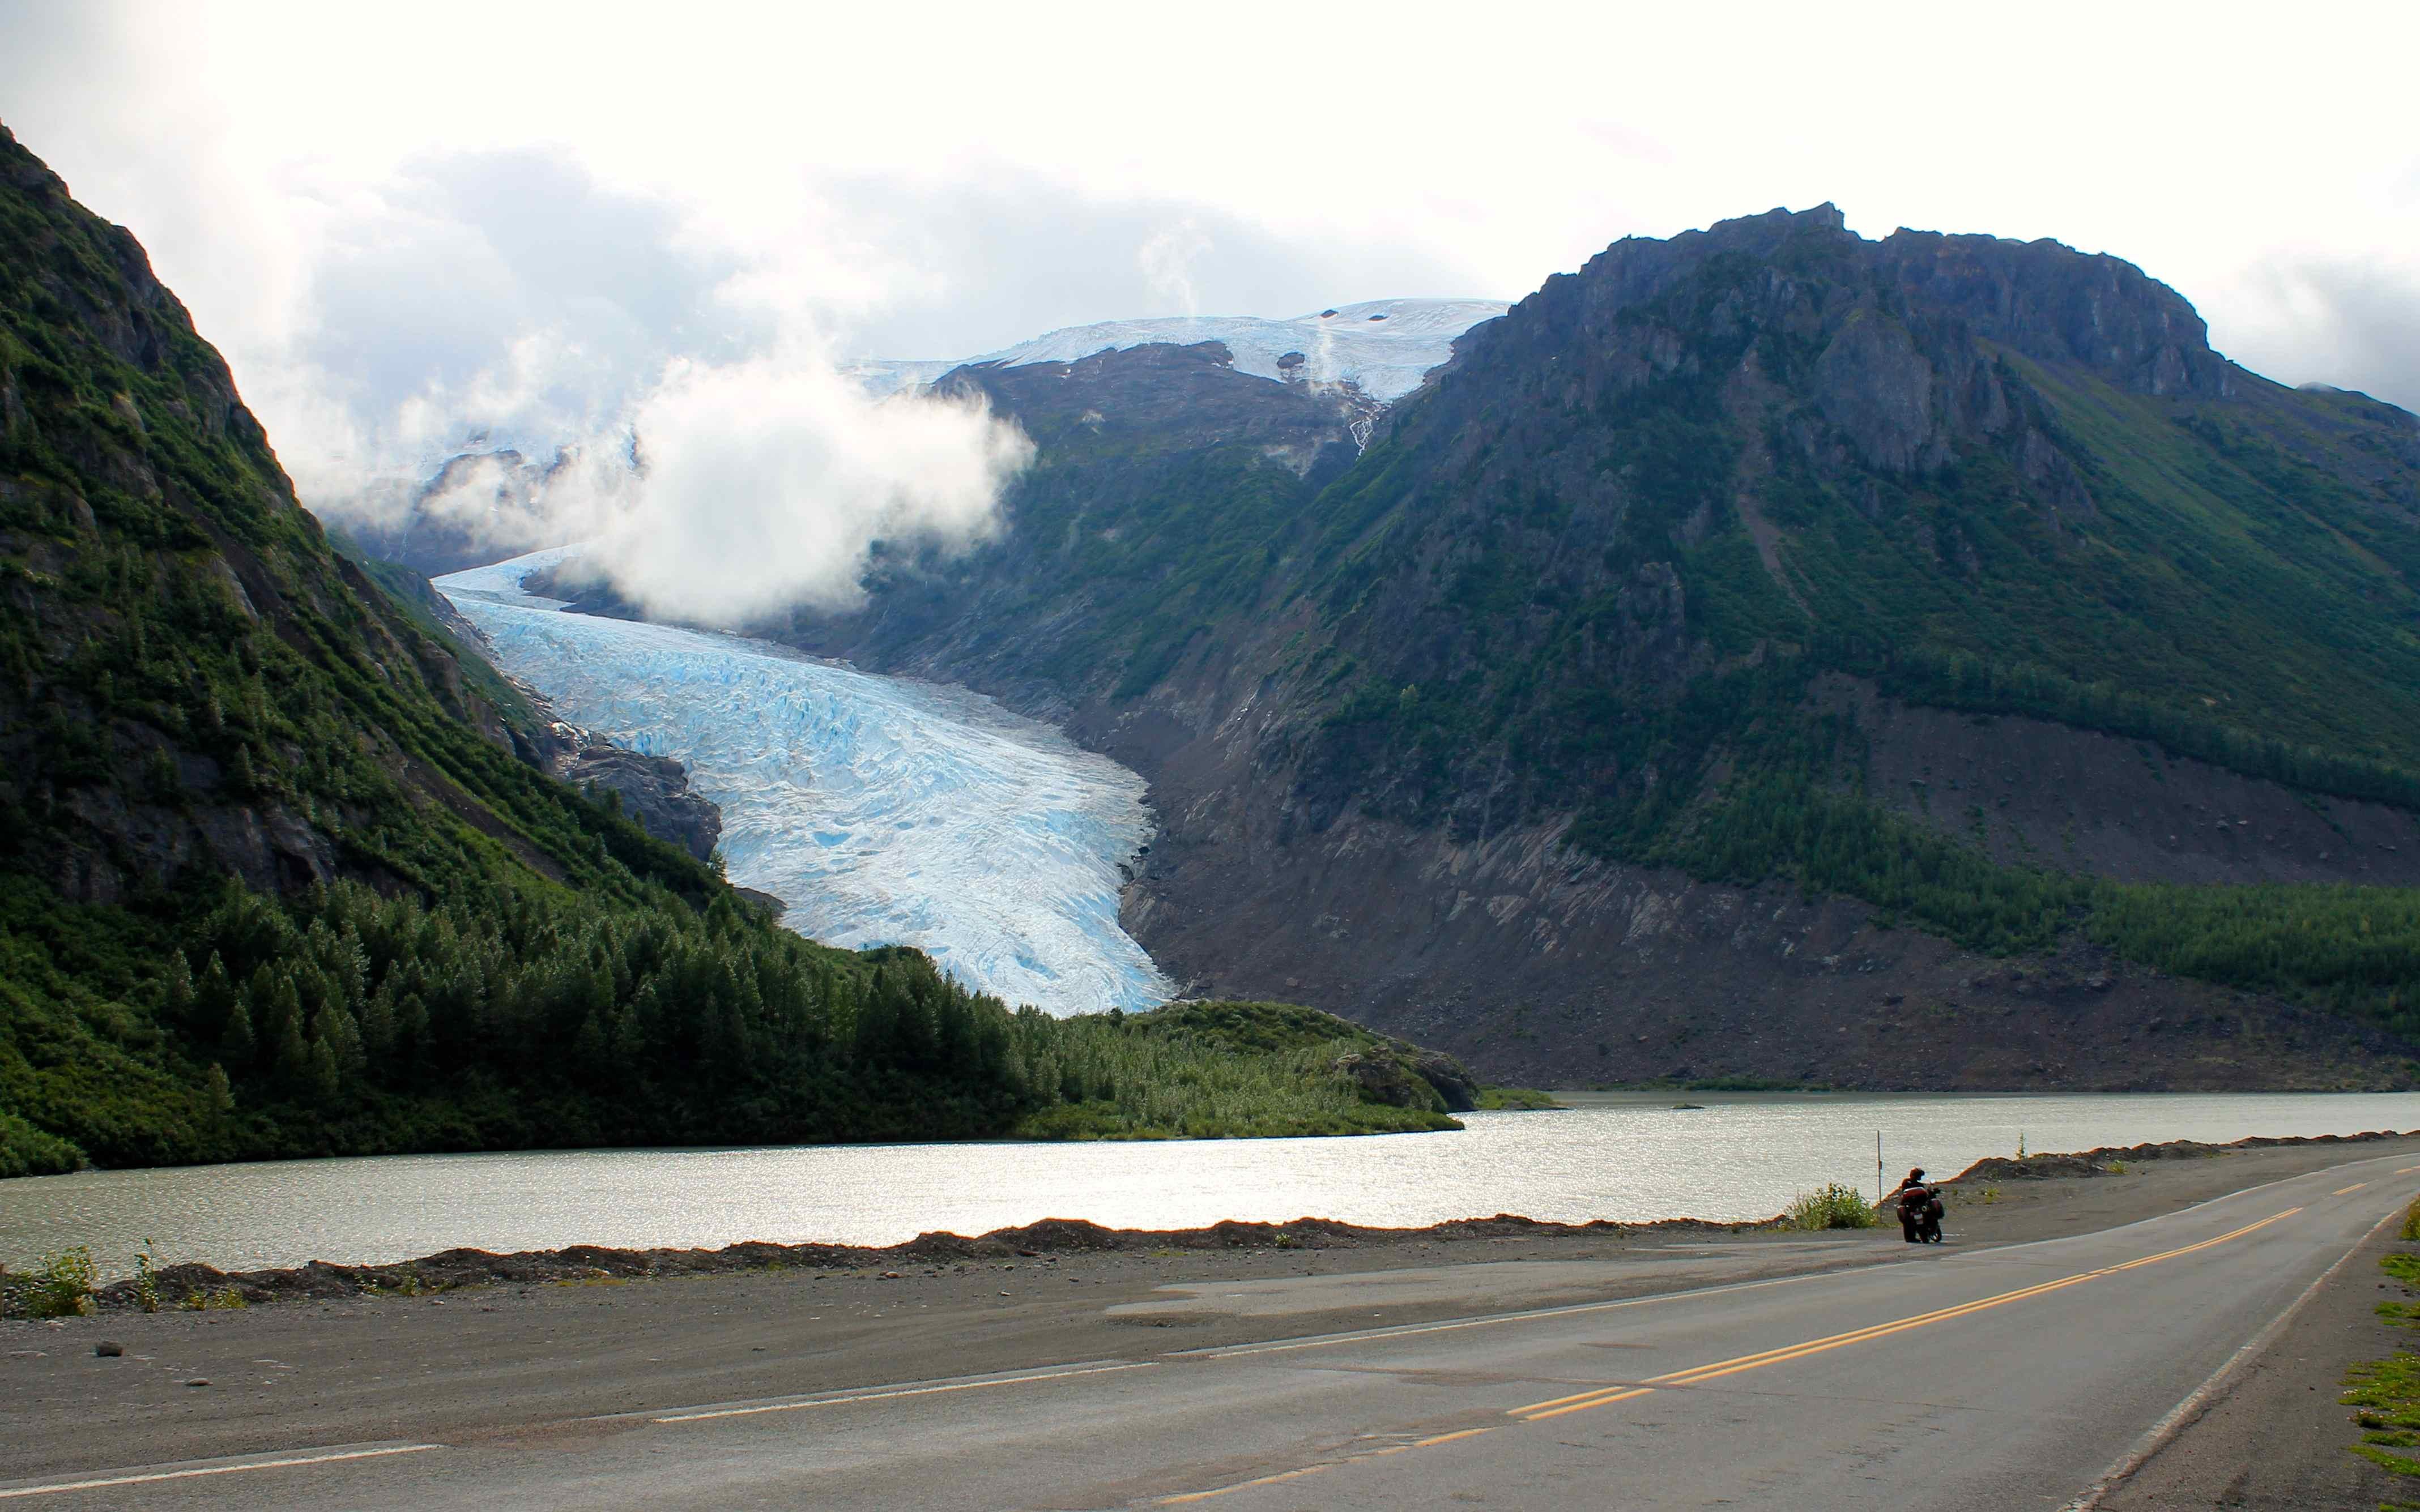 2015 Trip to Hyder Alaska 2015 Trip